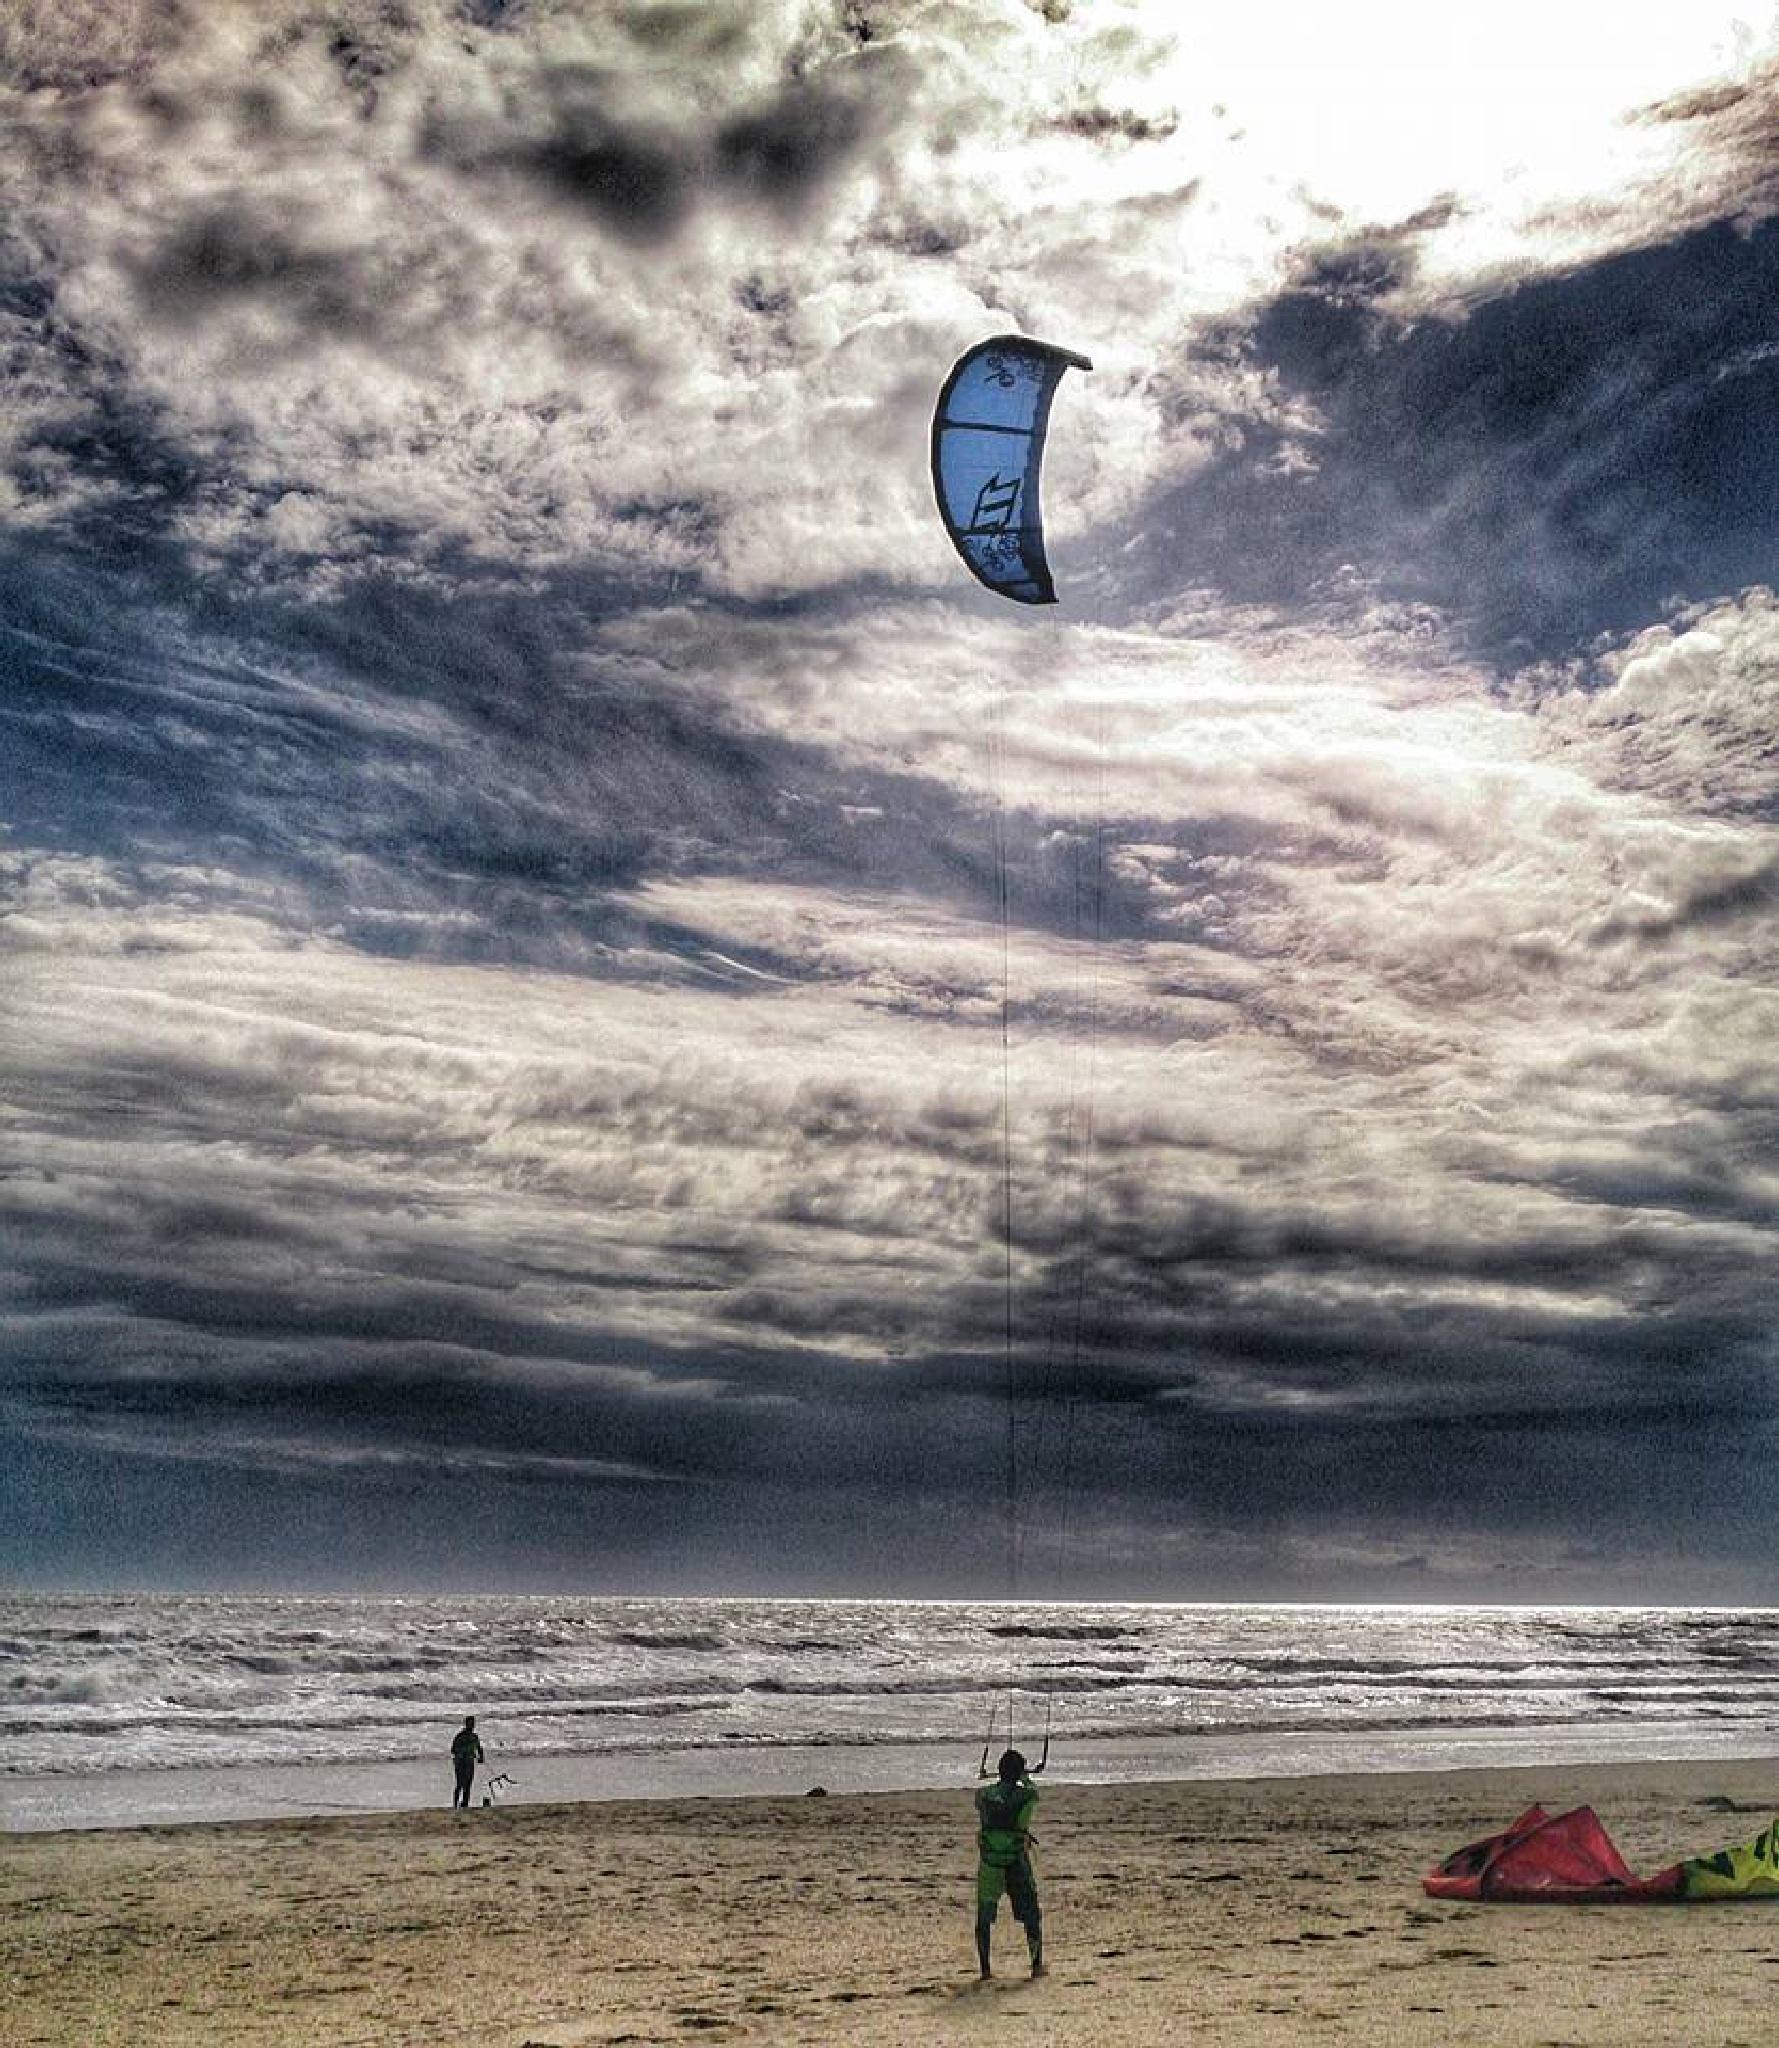 Kiteboareding by Manuela Azevedo